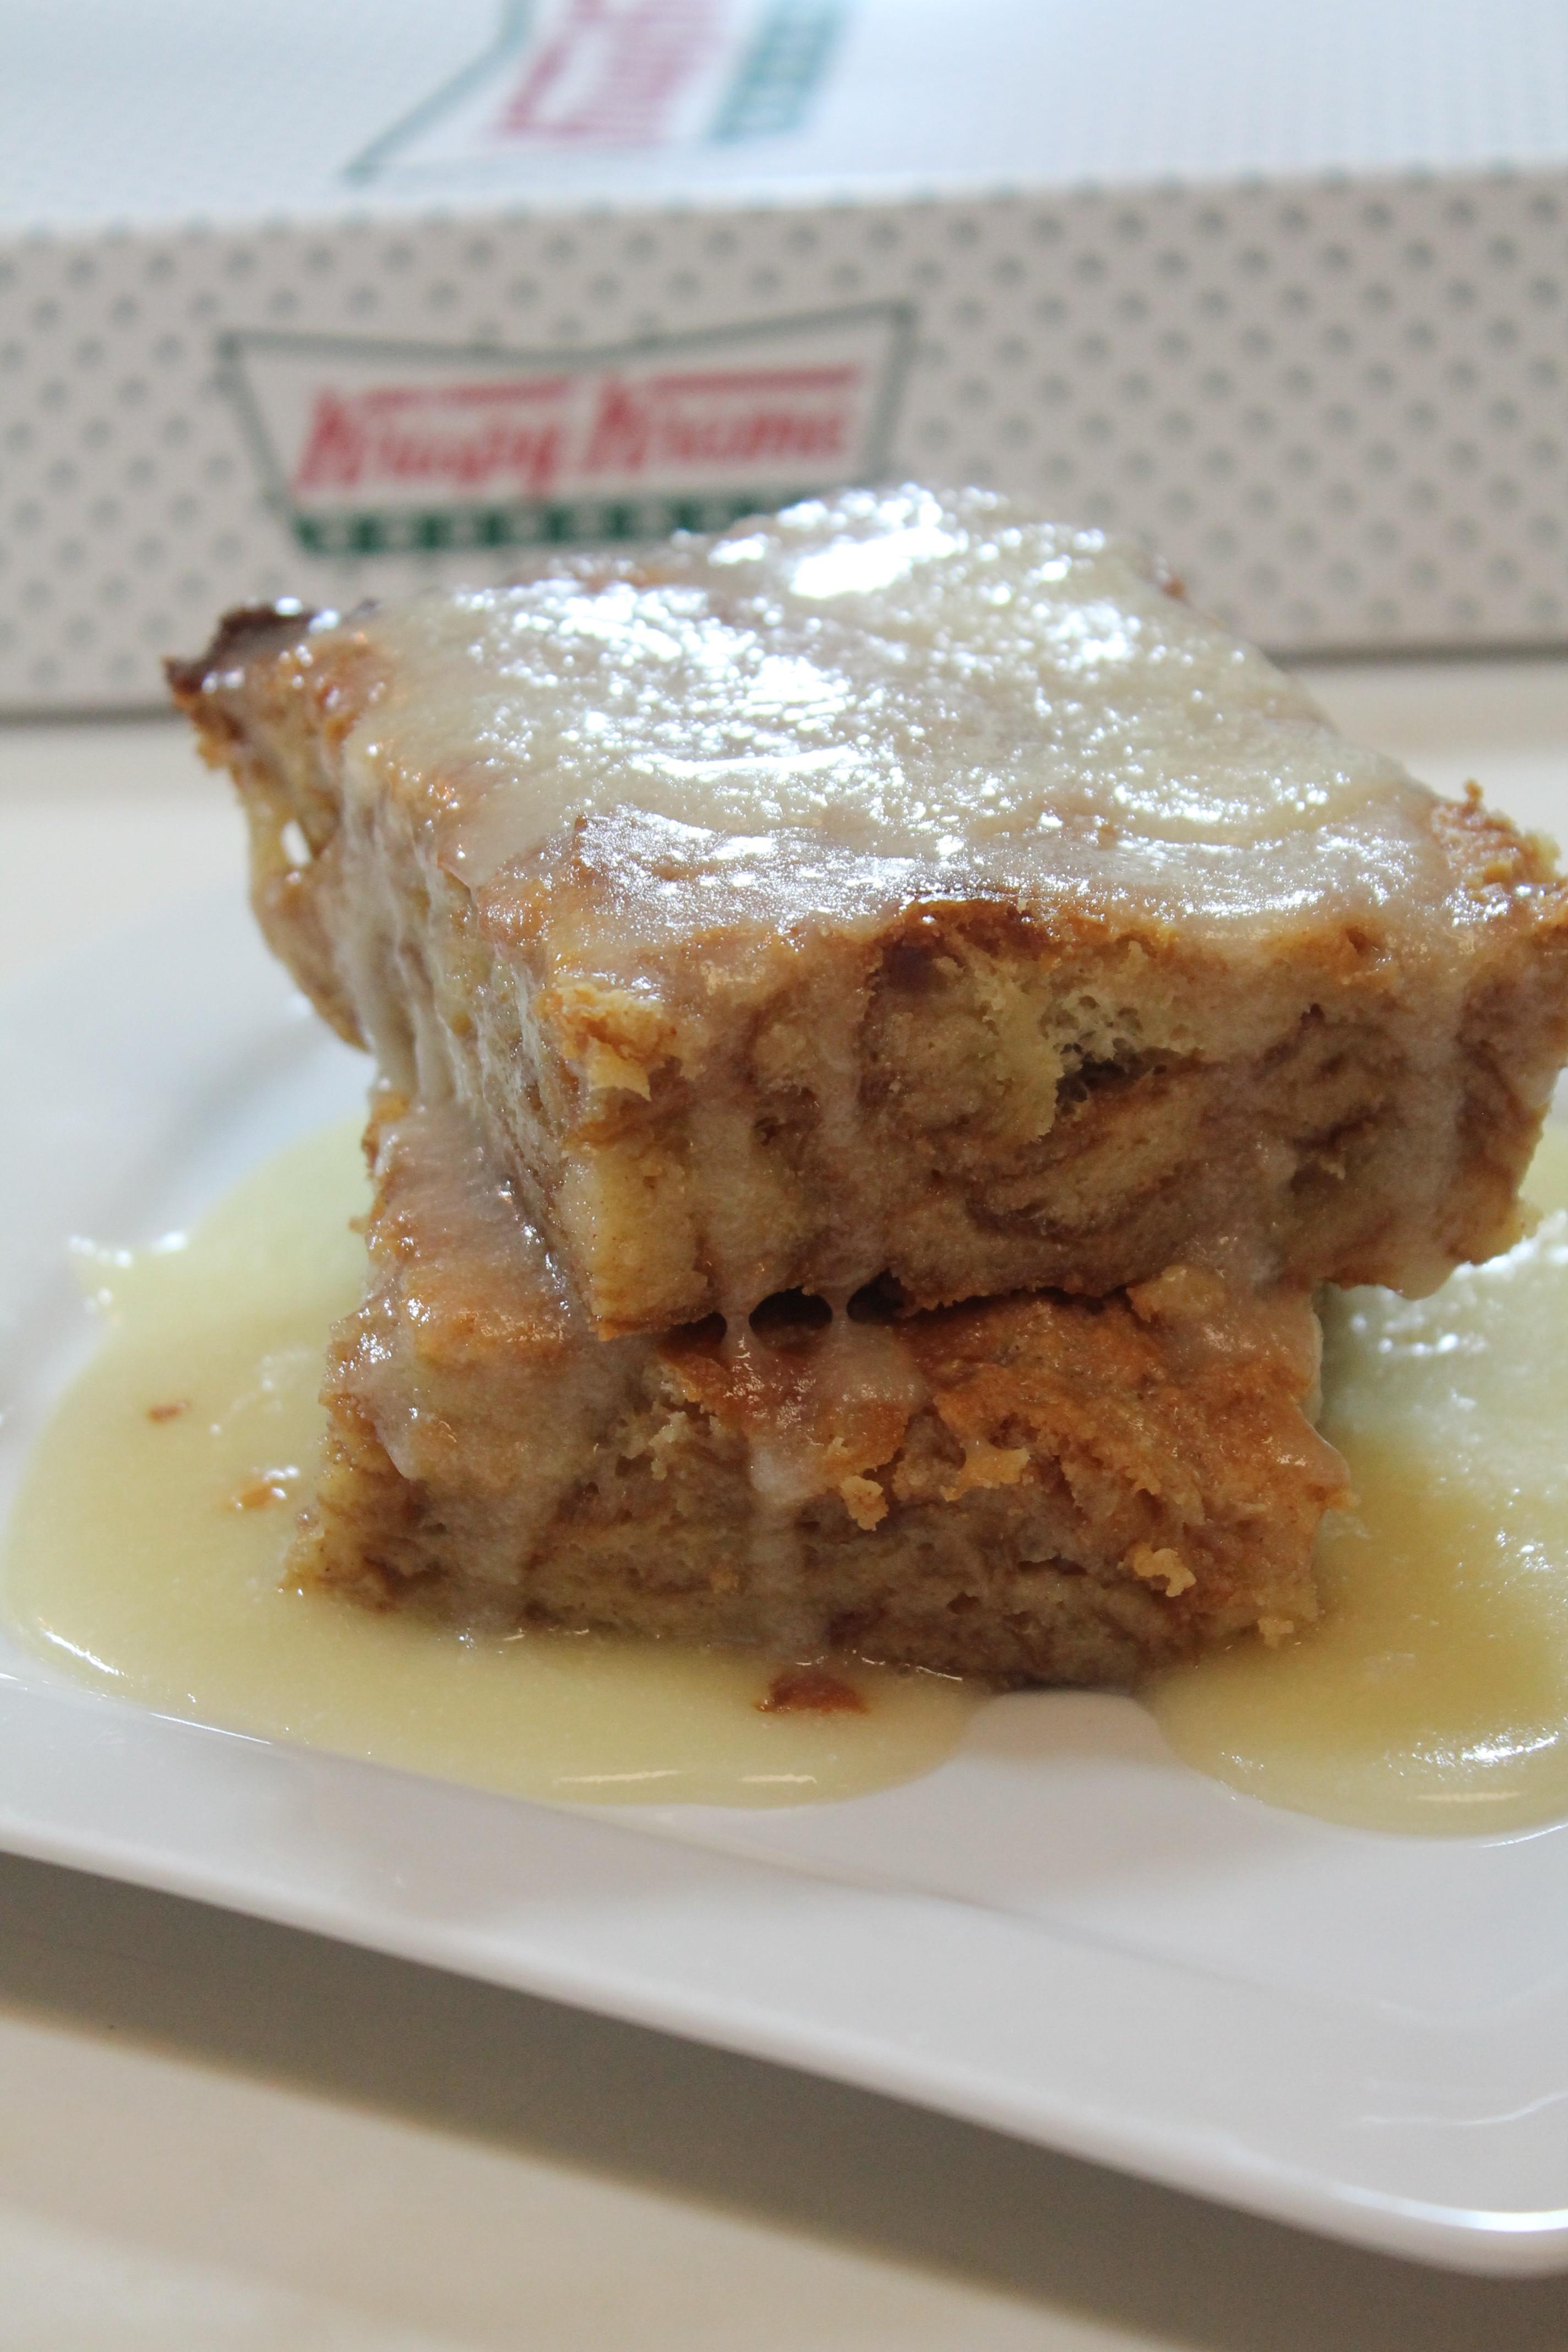 Krispy kreme donut bread pudding i heart recipes krispy kreme bread pudding recipe forumfinder Image collections